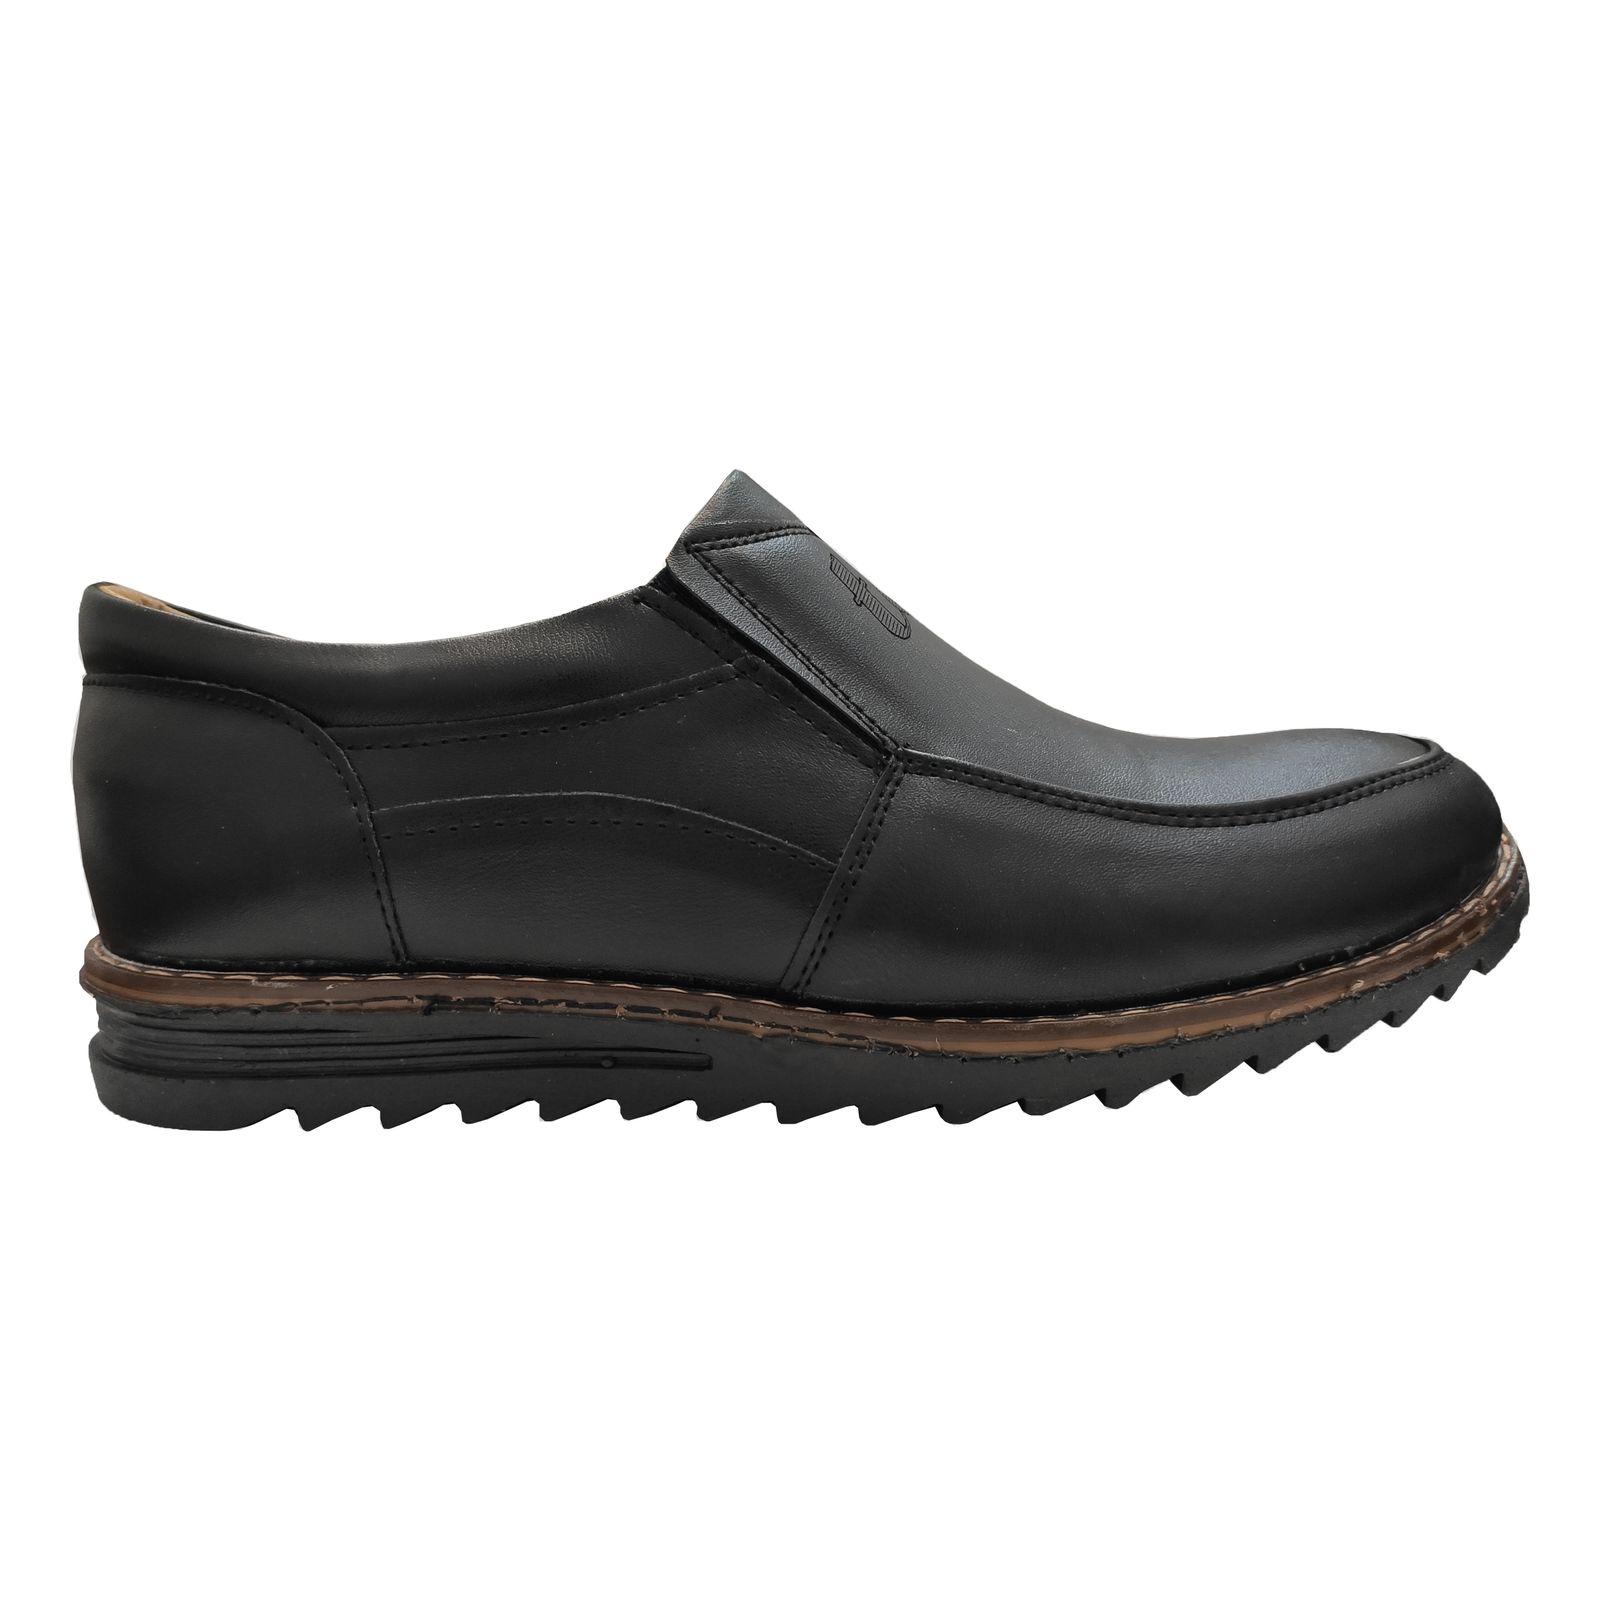 کفش روزمره مردانه مدل  SM1 -  - 5